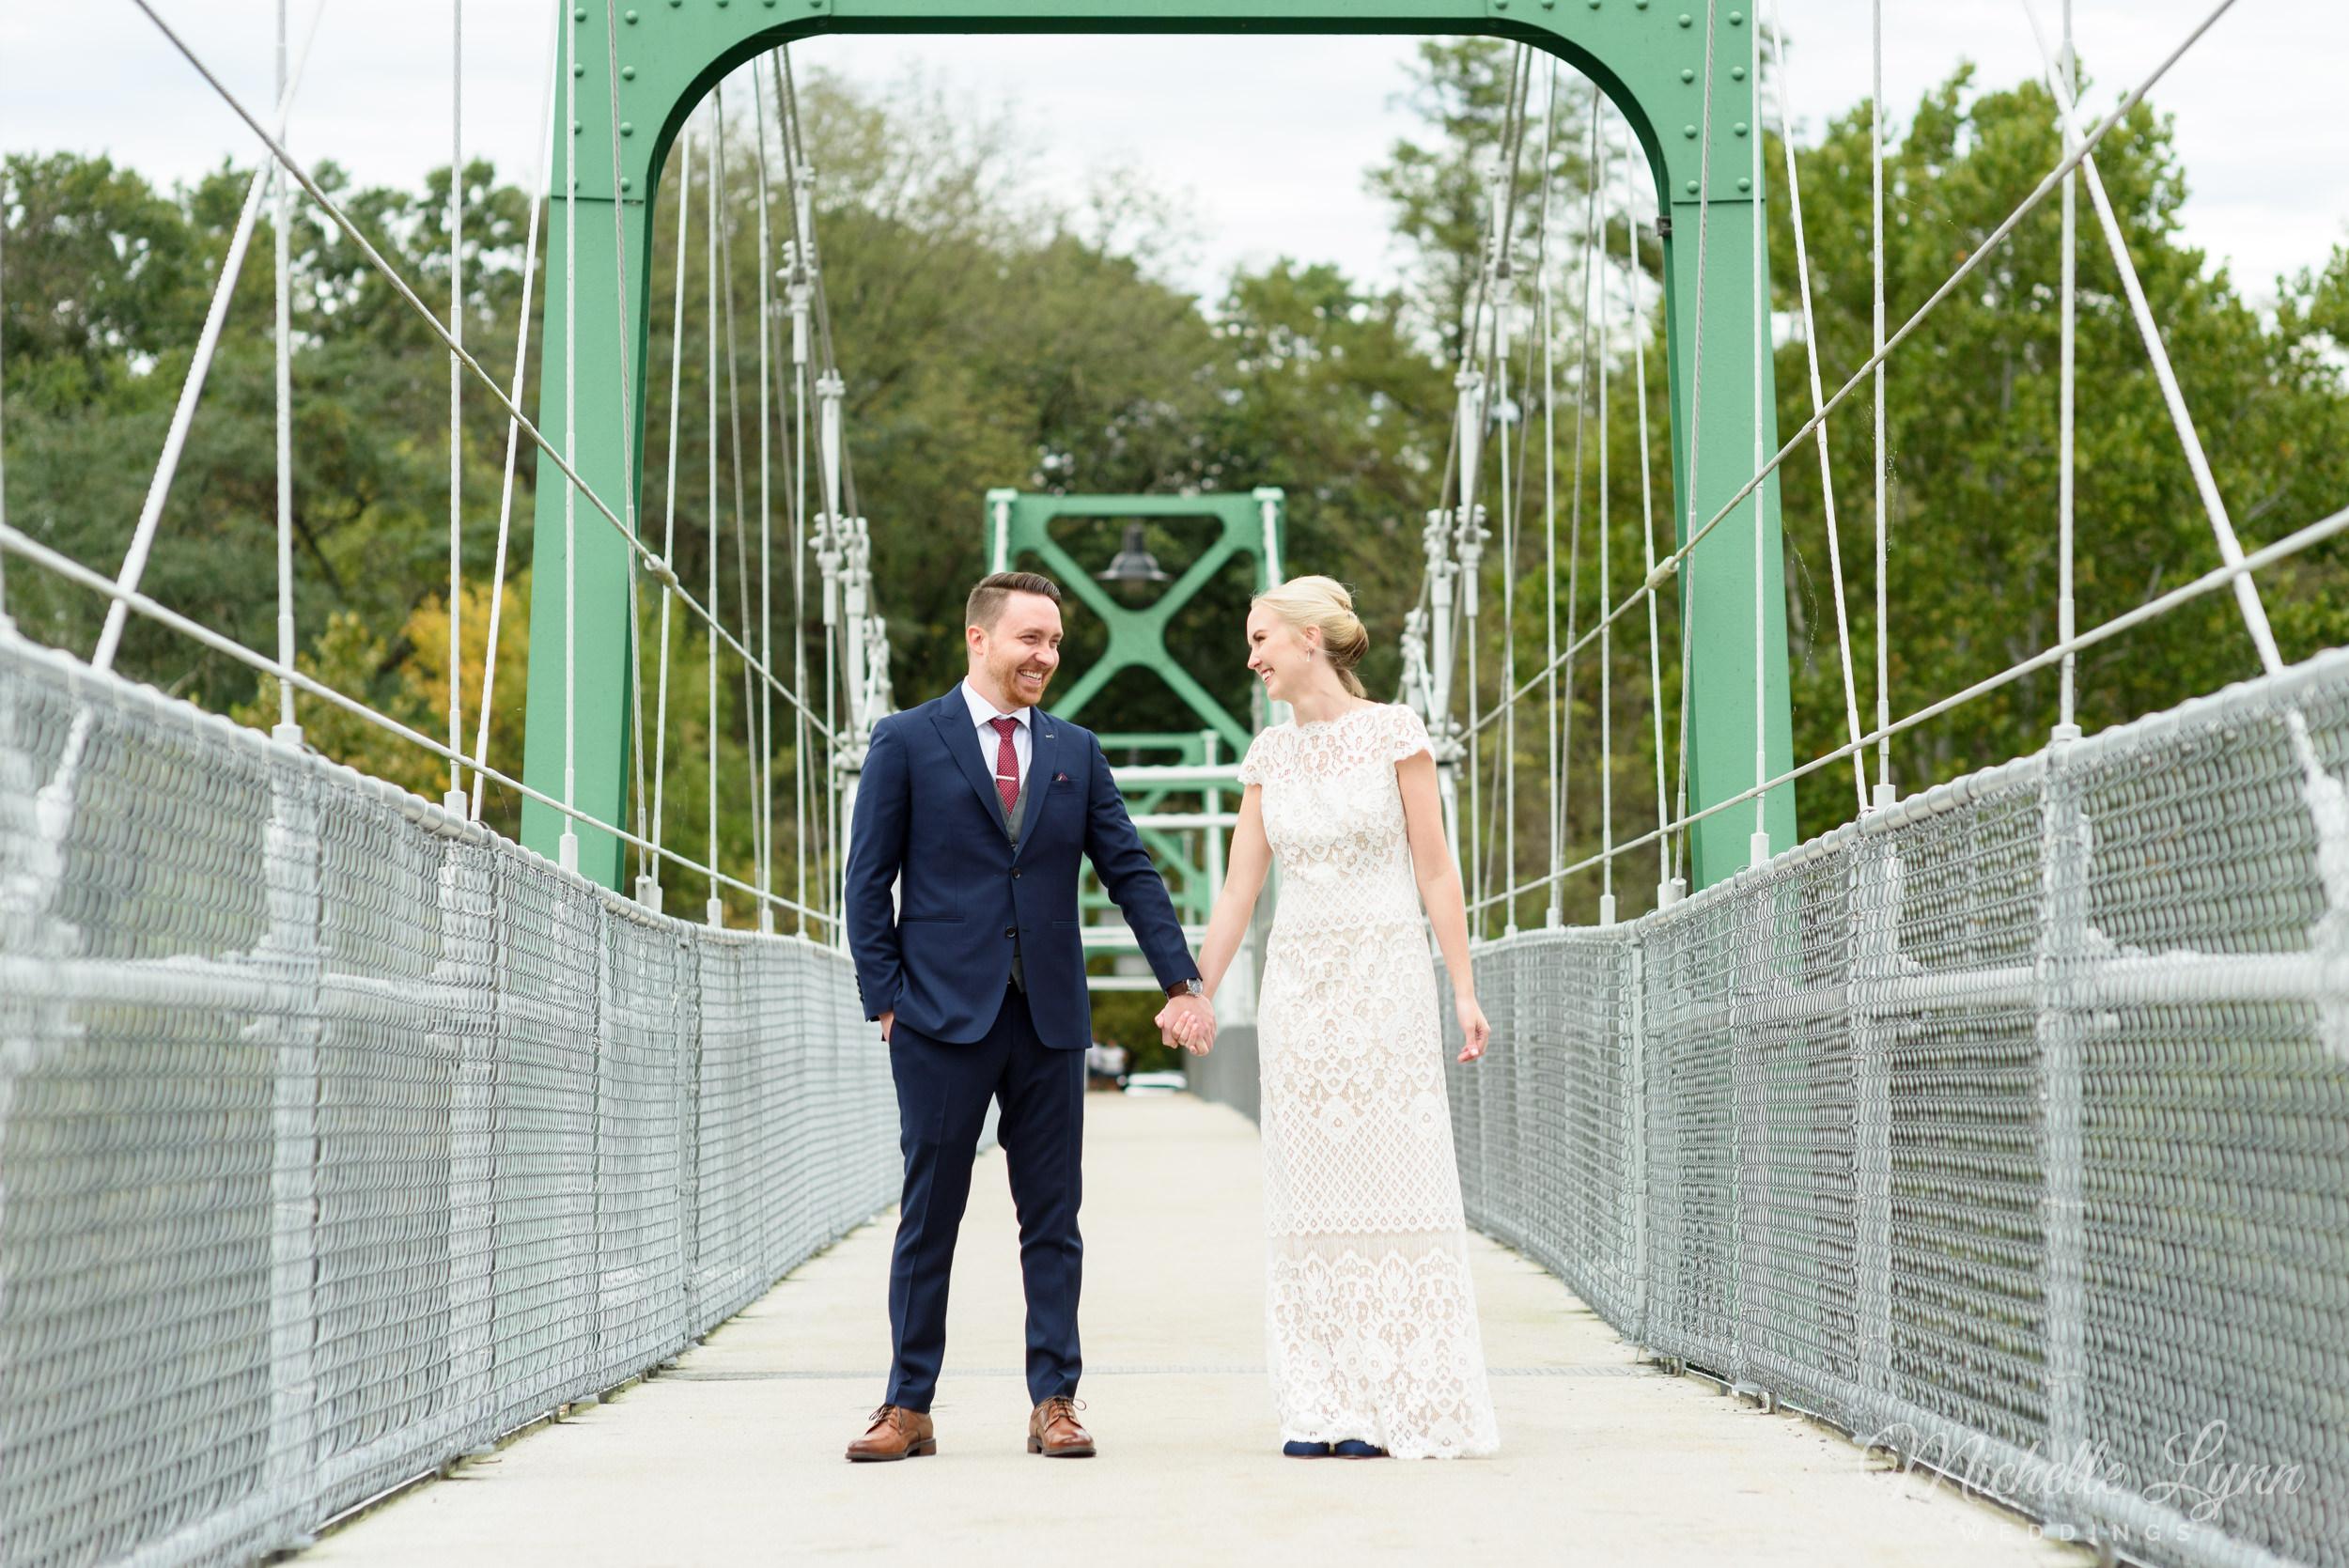 mlw-lumberville-general-store-new-hope-wedding-photographer-21.jpg